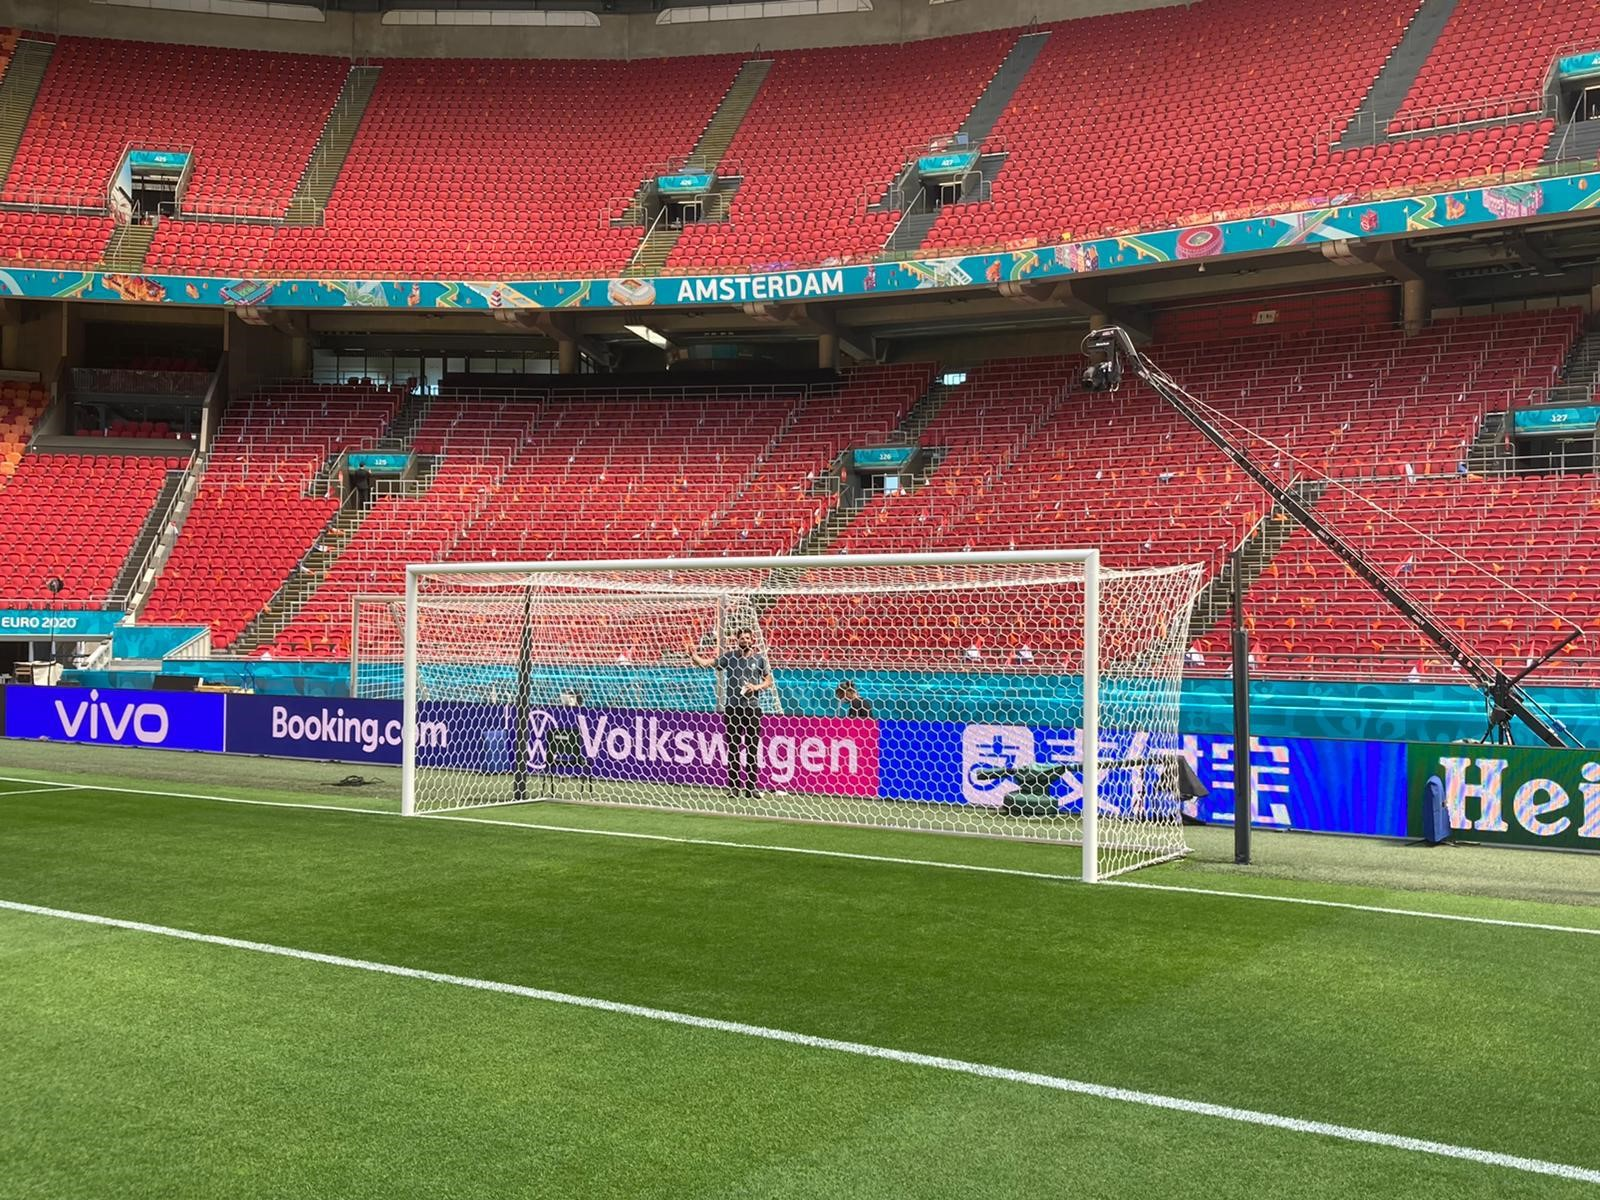 Doelen Johan Cruyff Arena